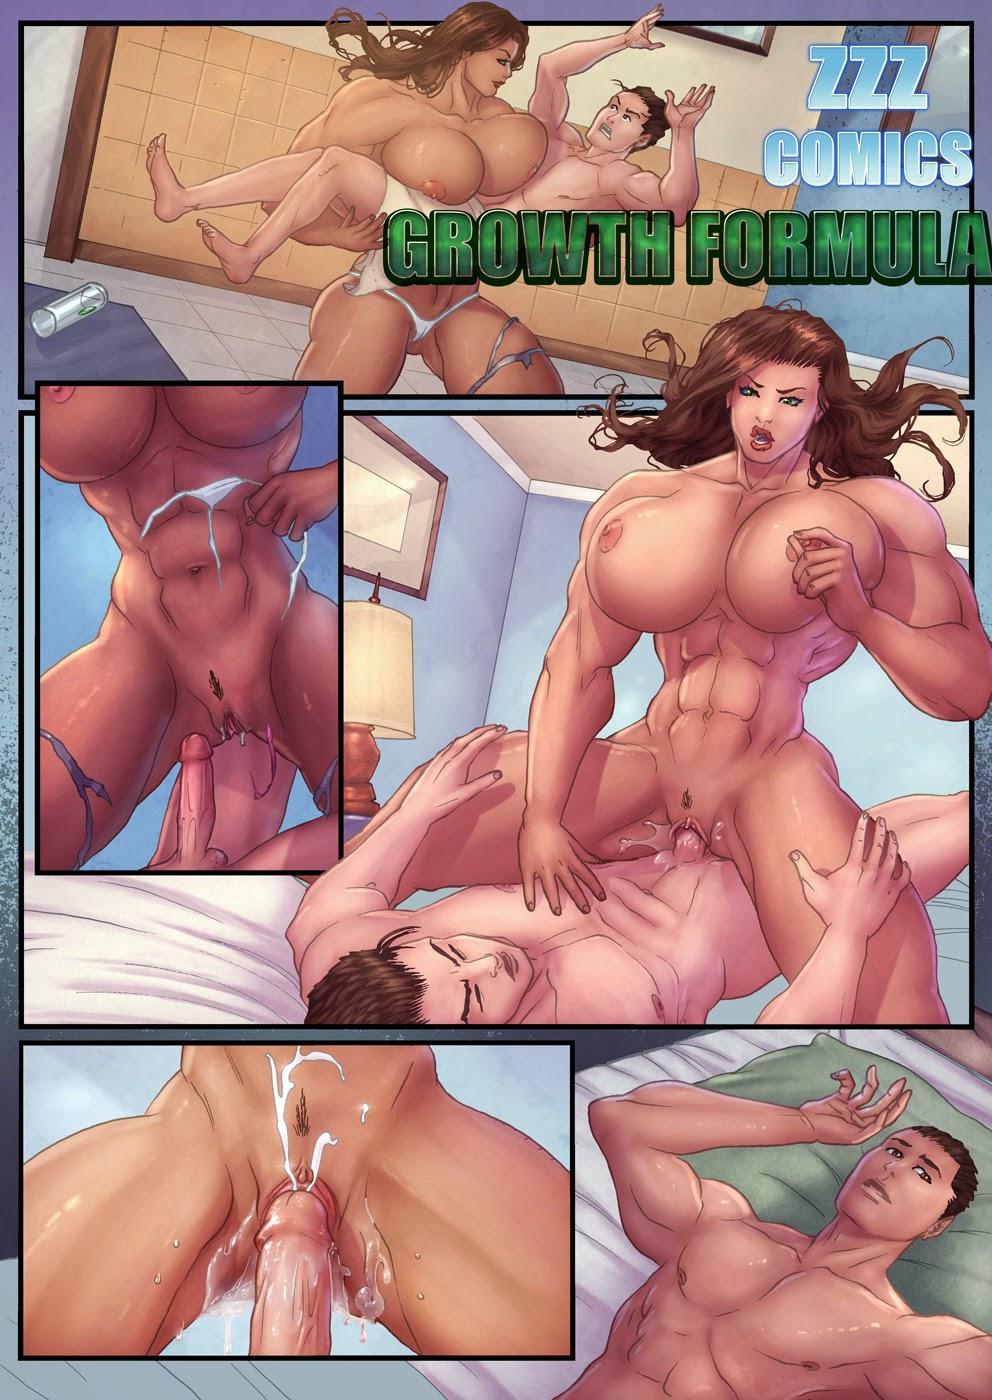 Sex growth